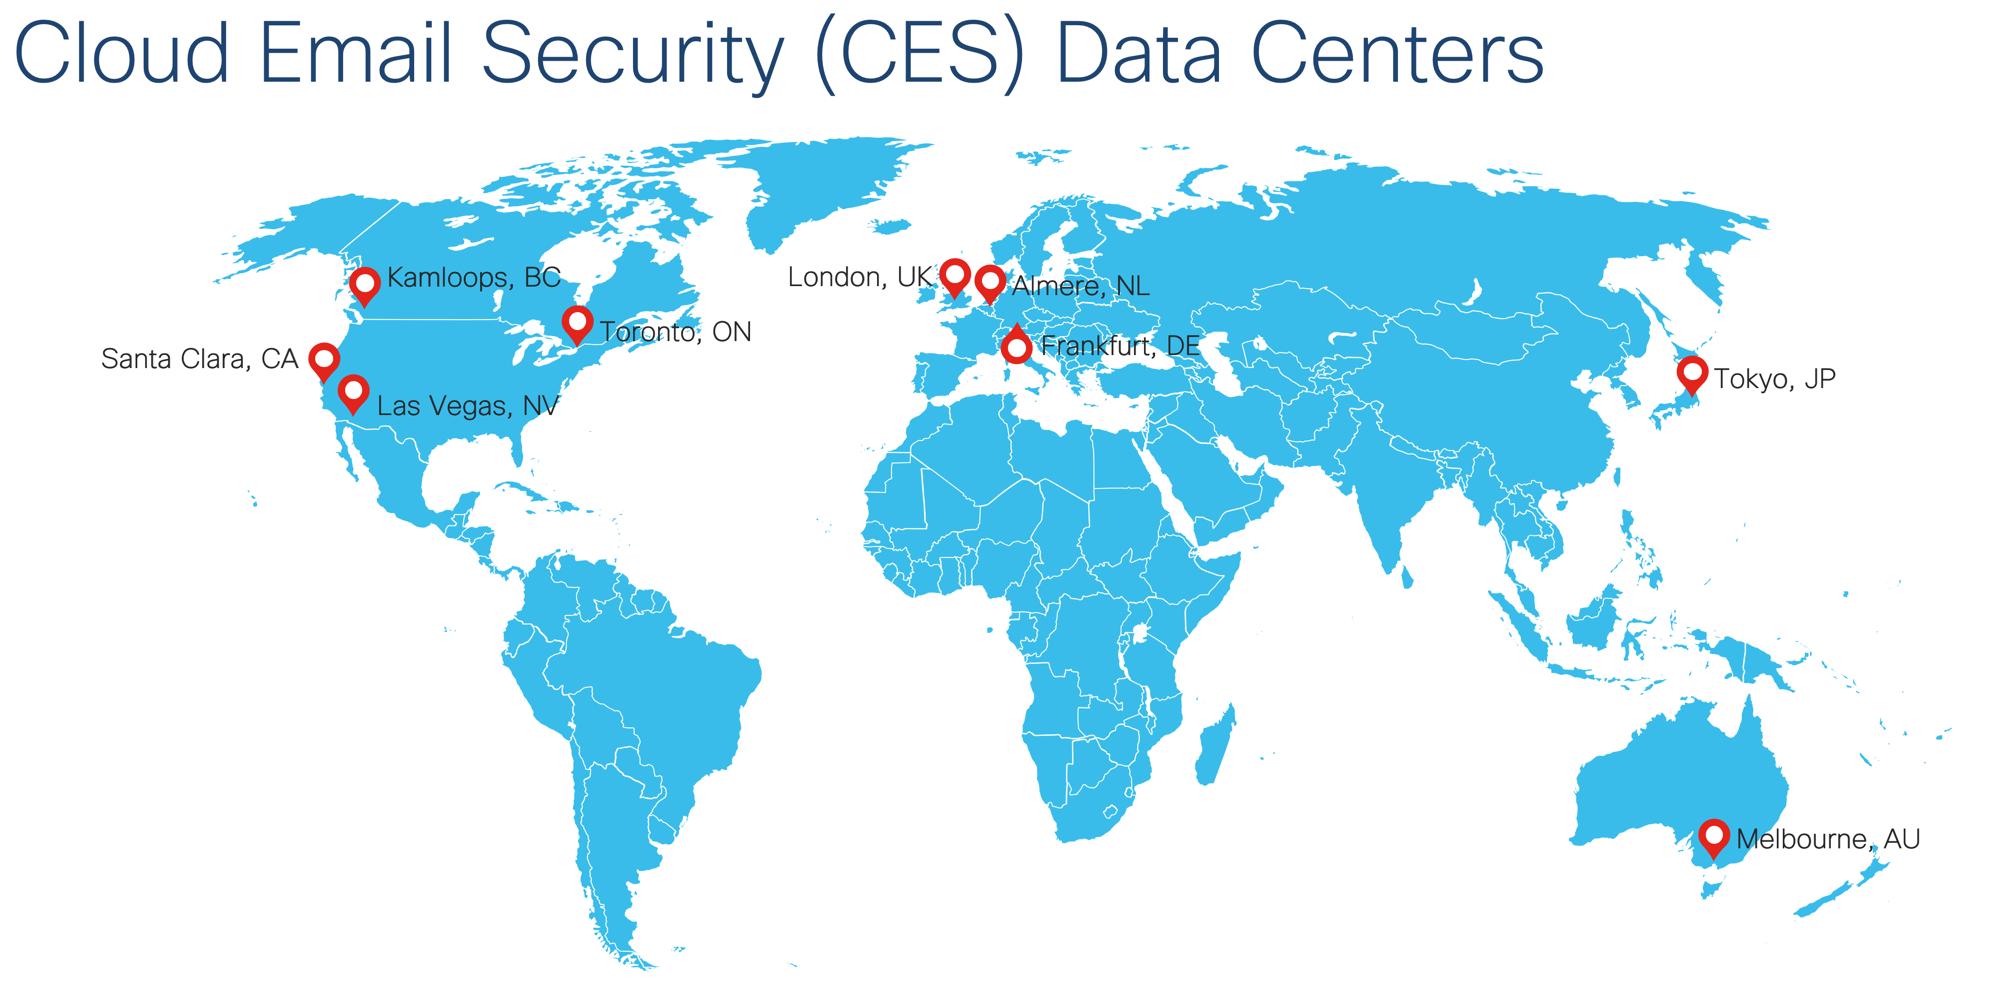 Cisco CES Datacenter Map (as of 8/2019)